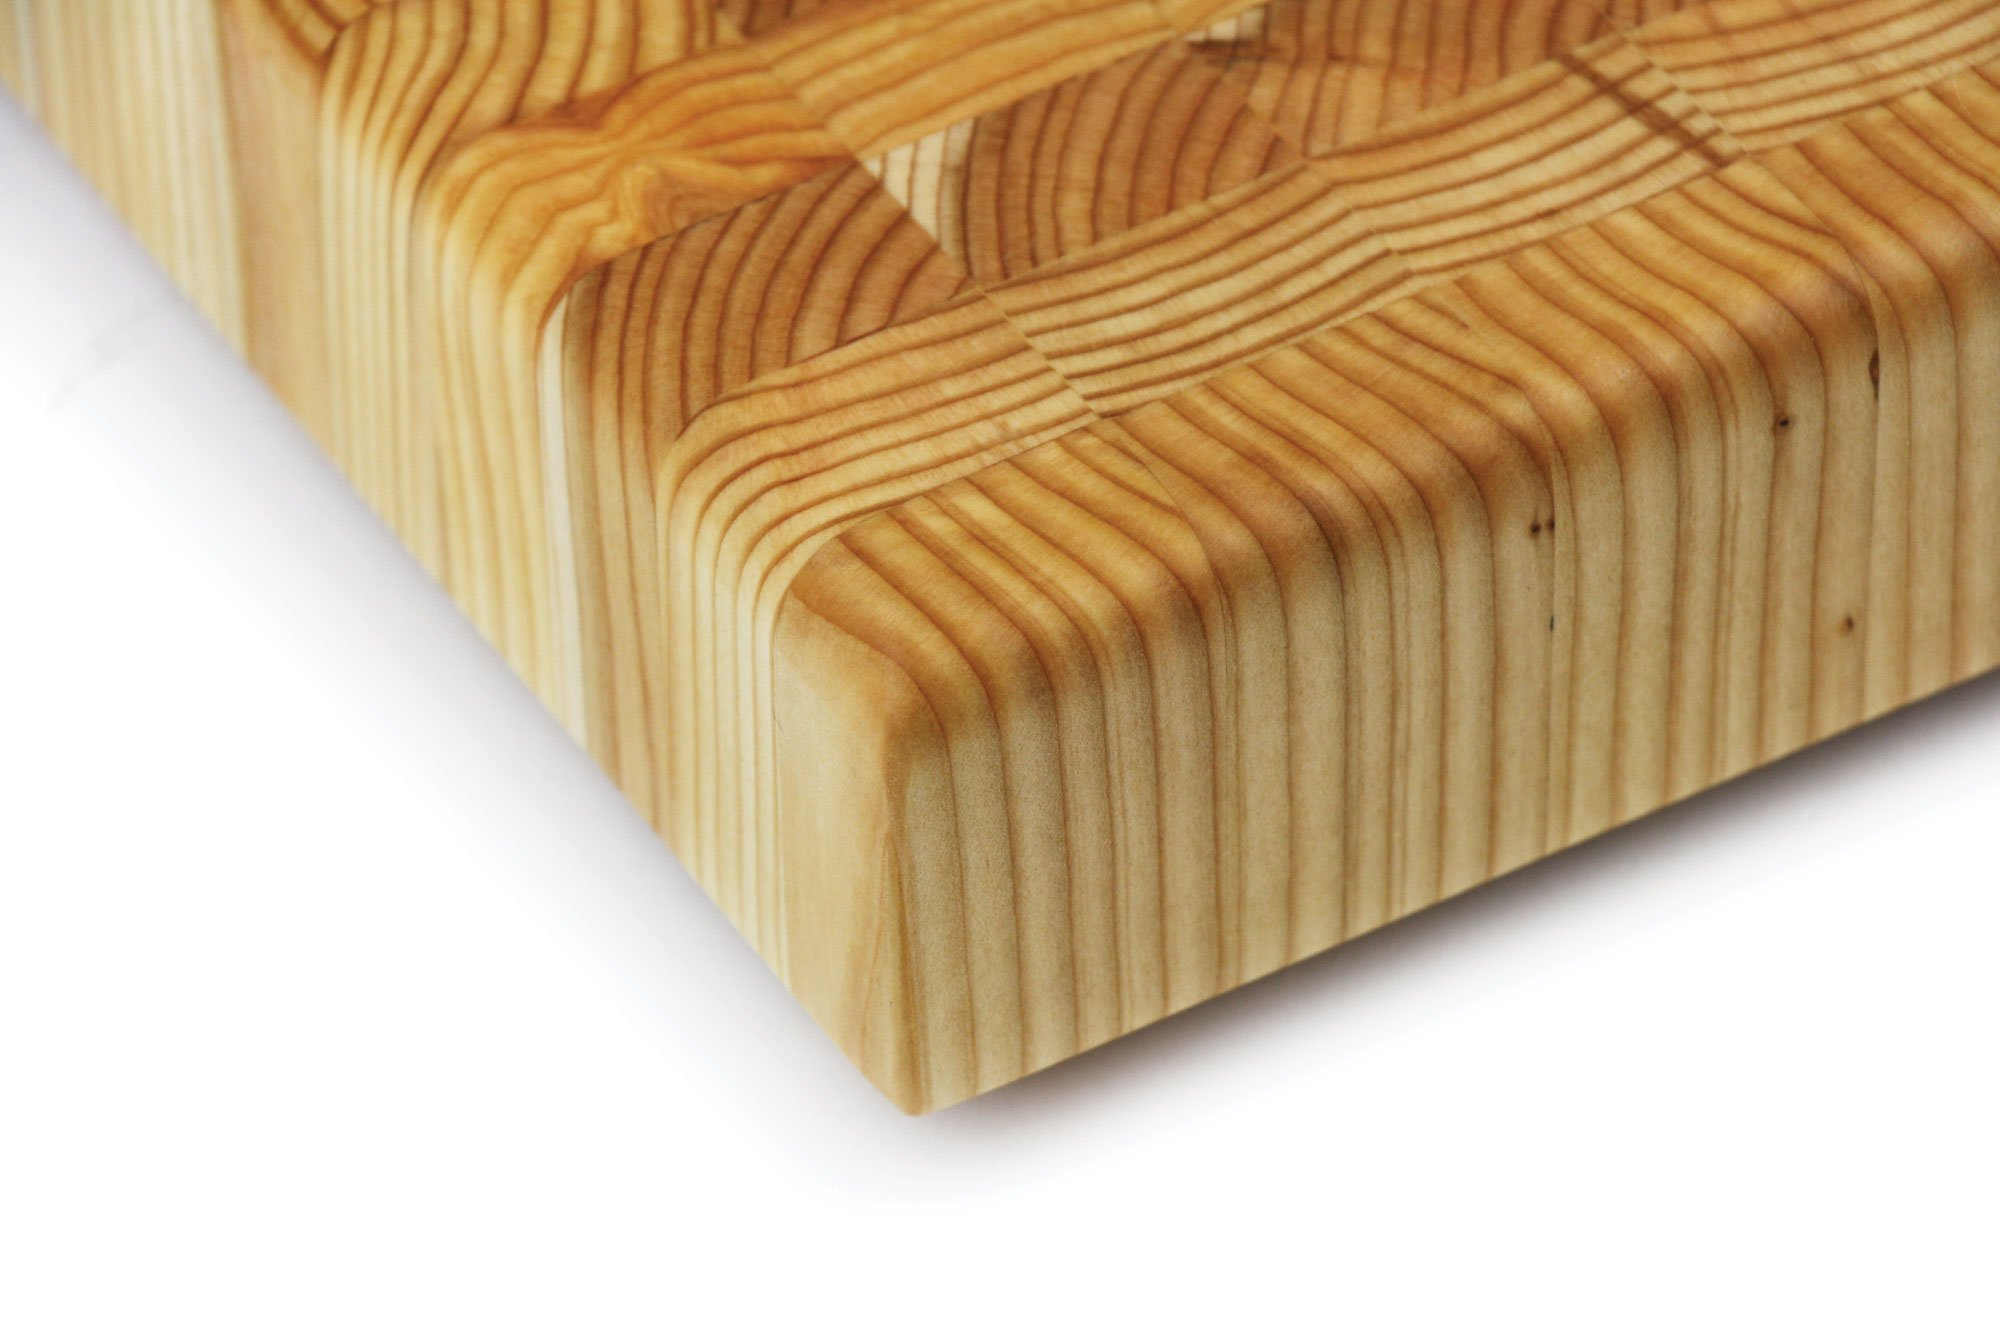 Larch Wood 24 x 18 x 2-inch End Grain Cutting Board by Larch Wood (Image #2)